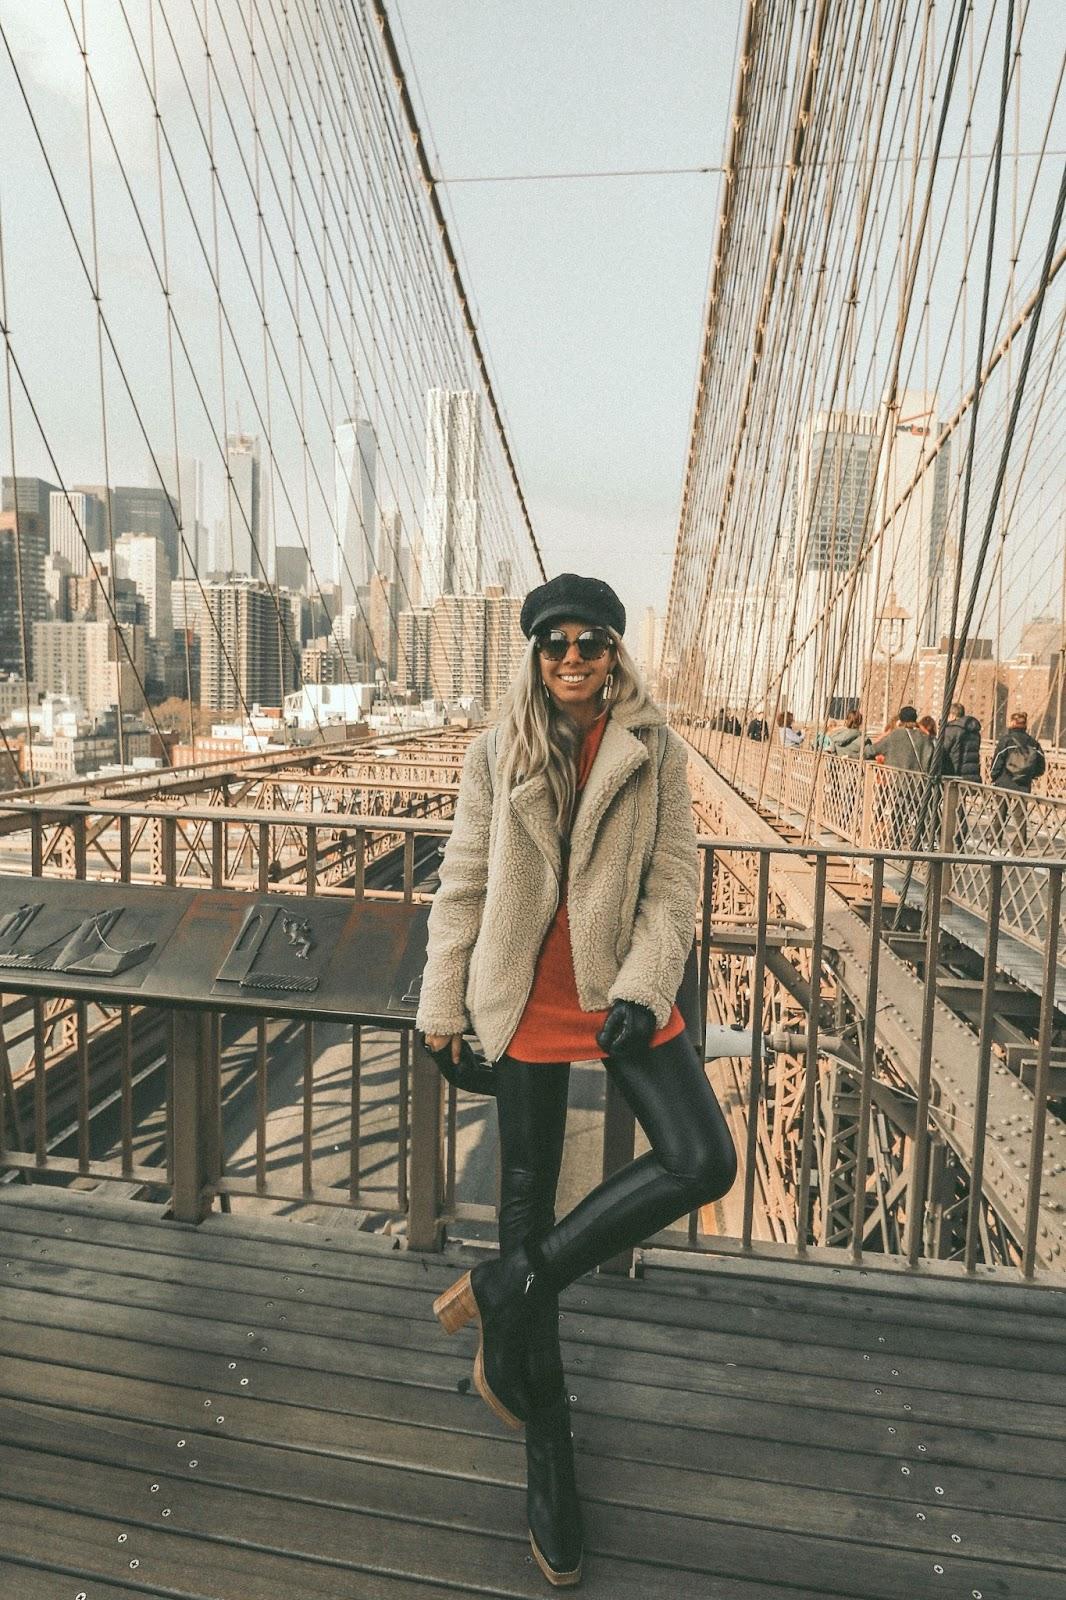 Brooklyn Bridge winter outfit